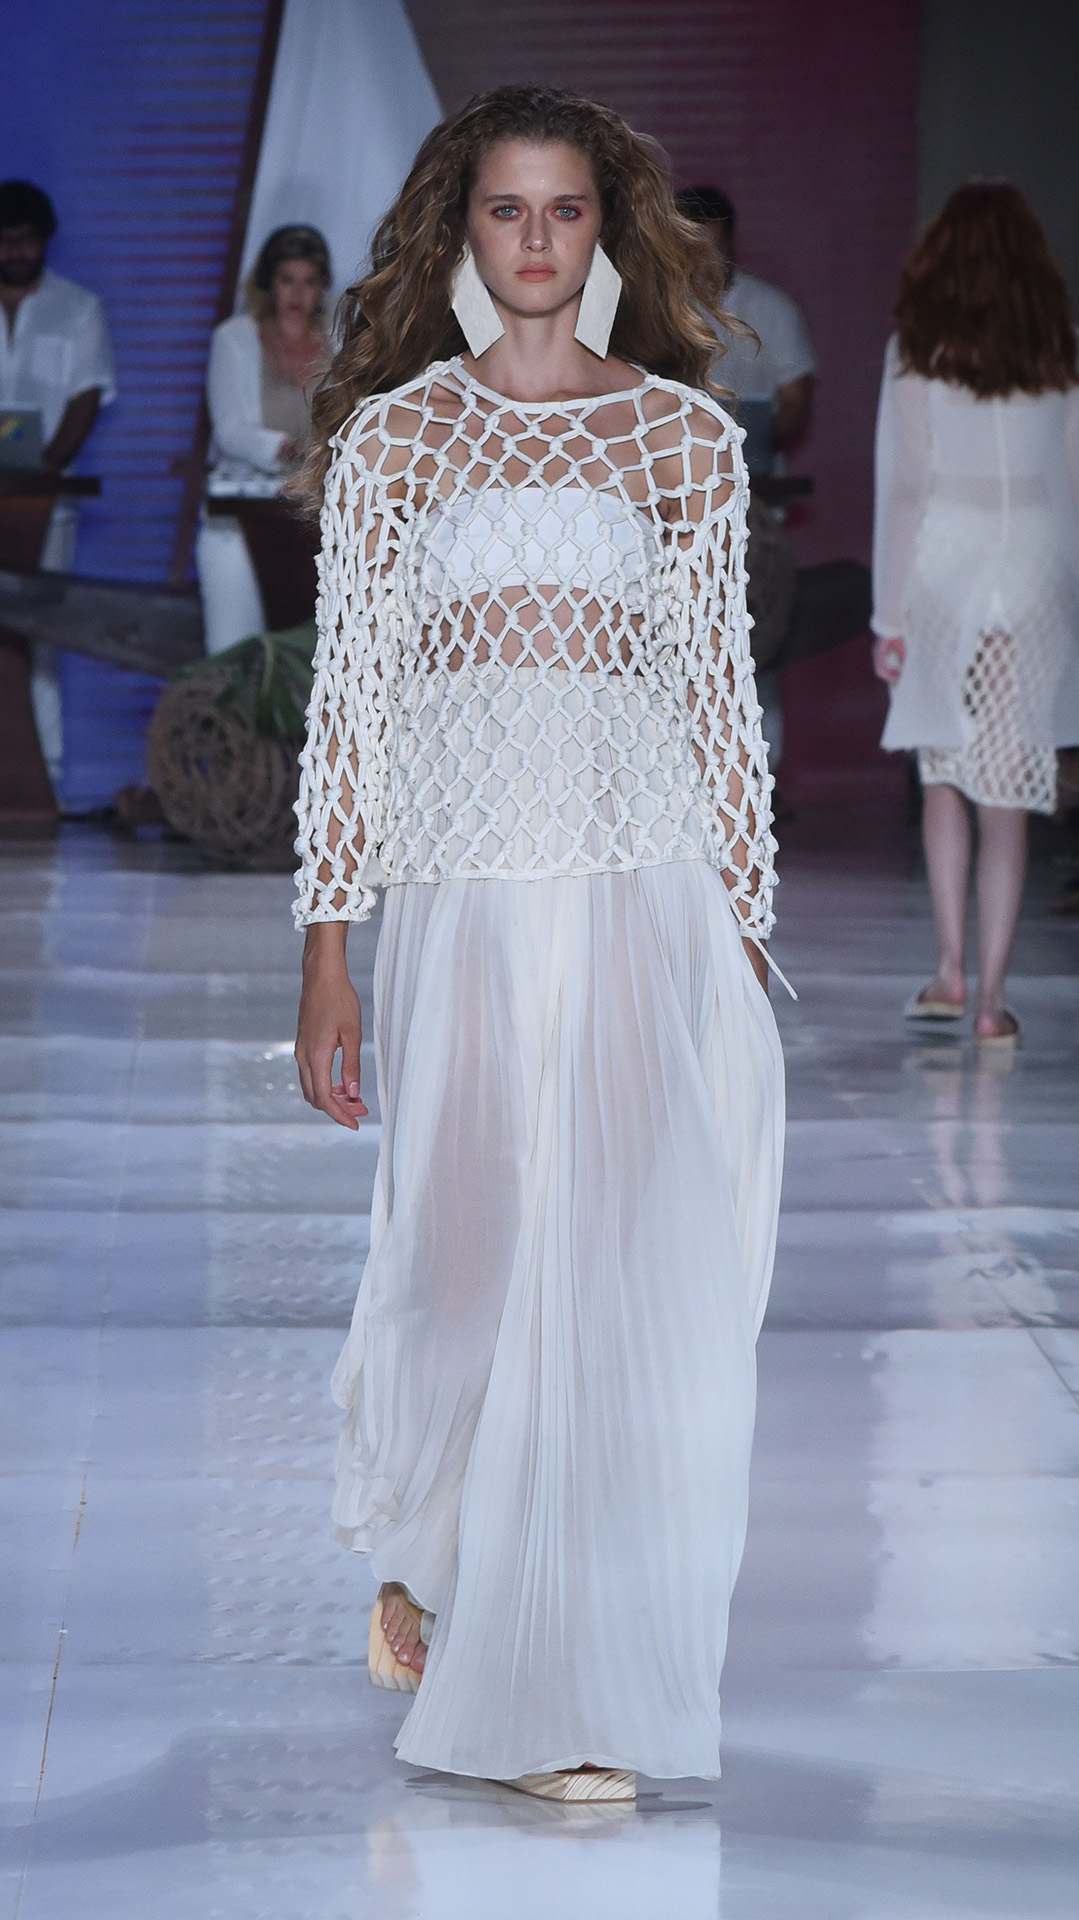 Total White, un must del próximo verano (Jangadeiro Textil).